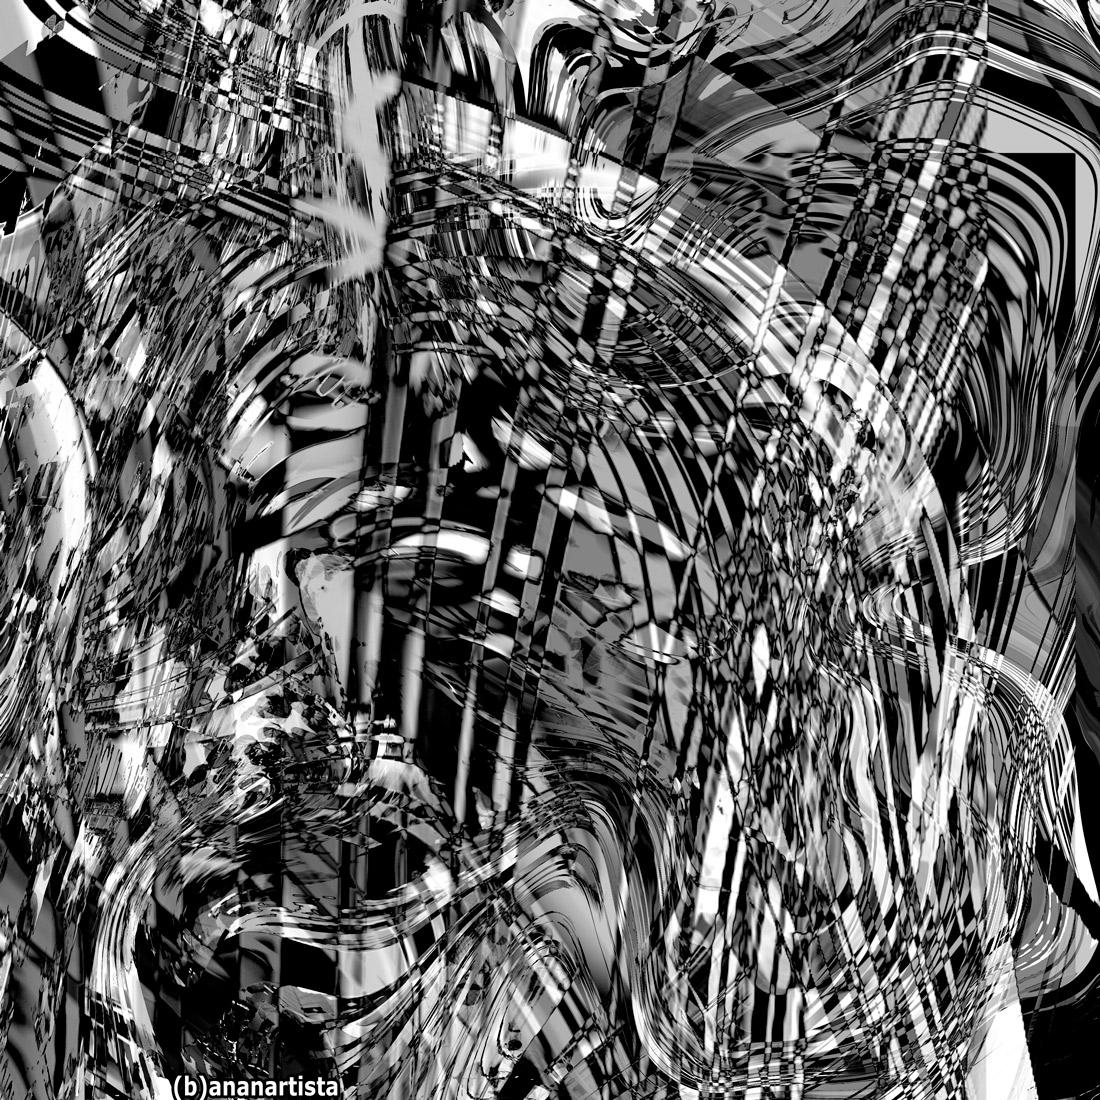 rumi abstract digital art by (b)ananartista sbuff